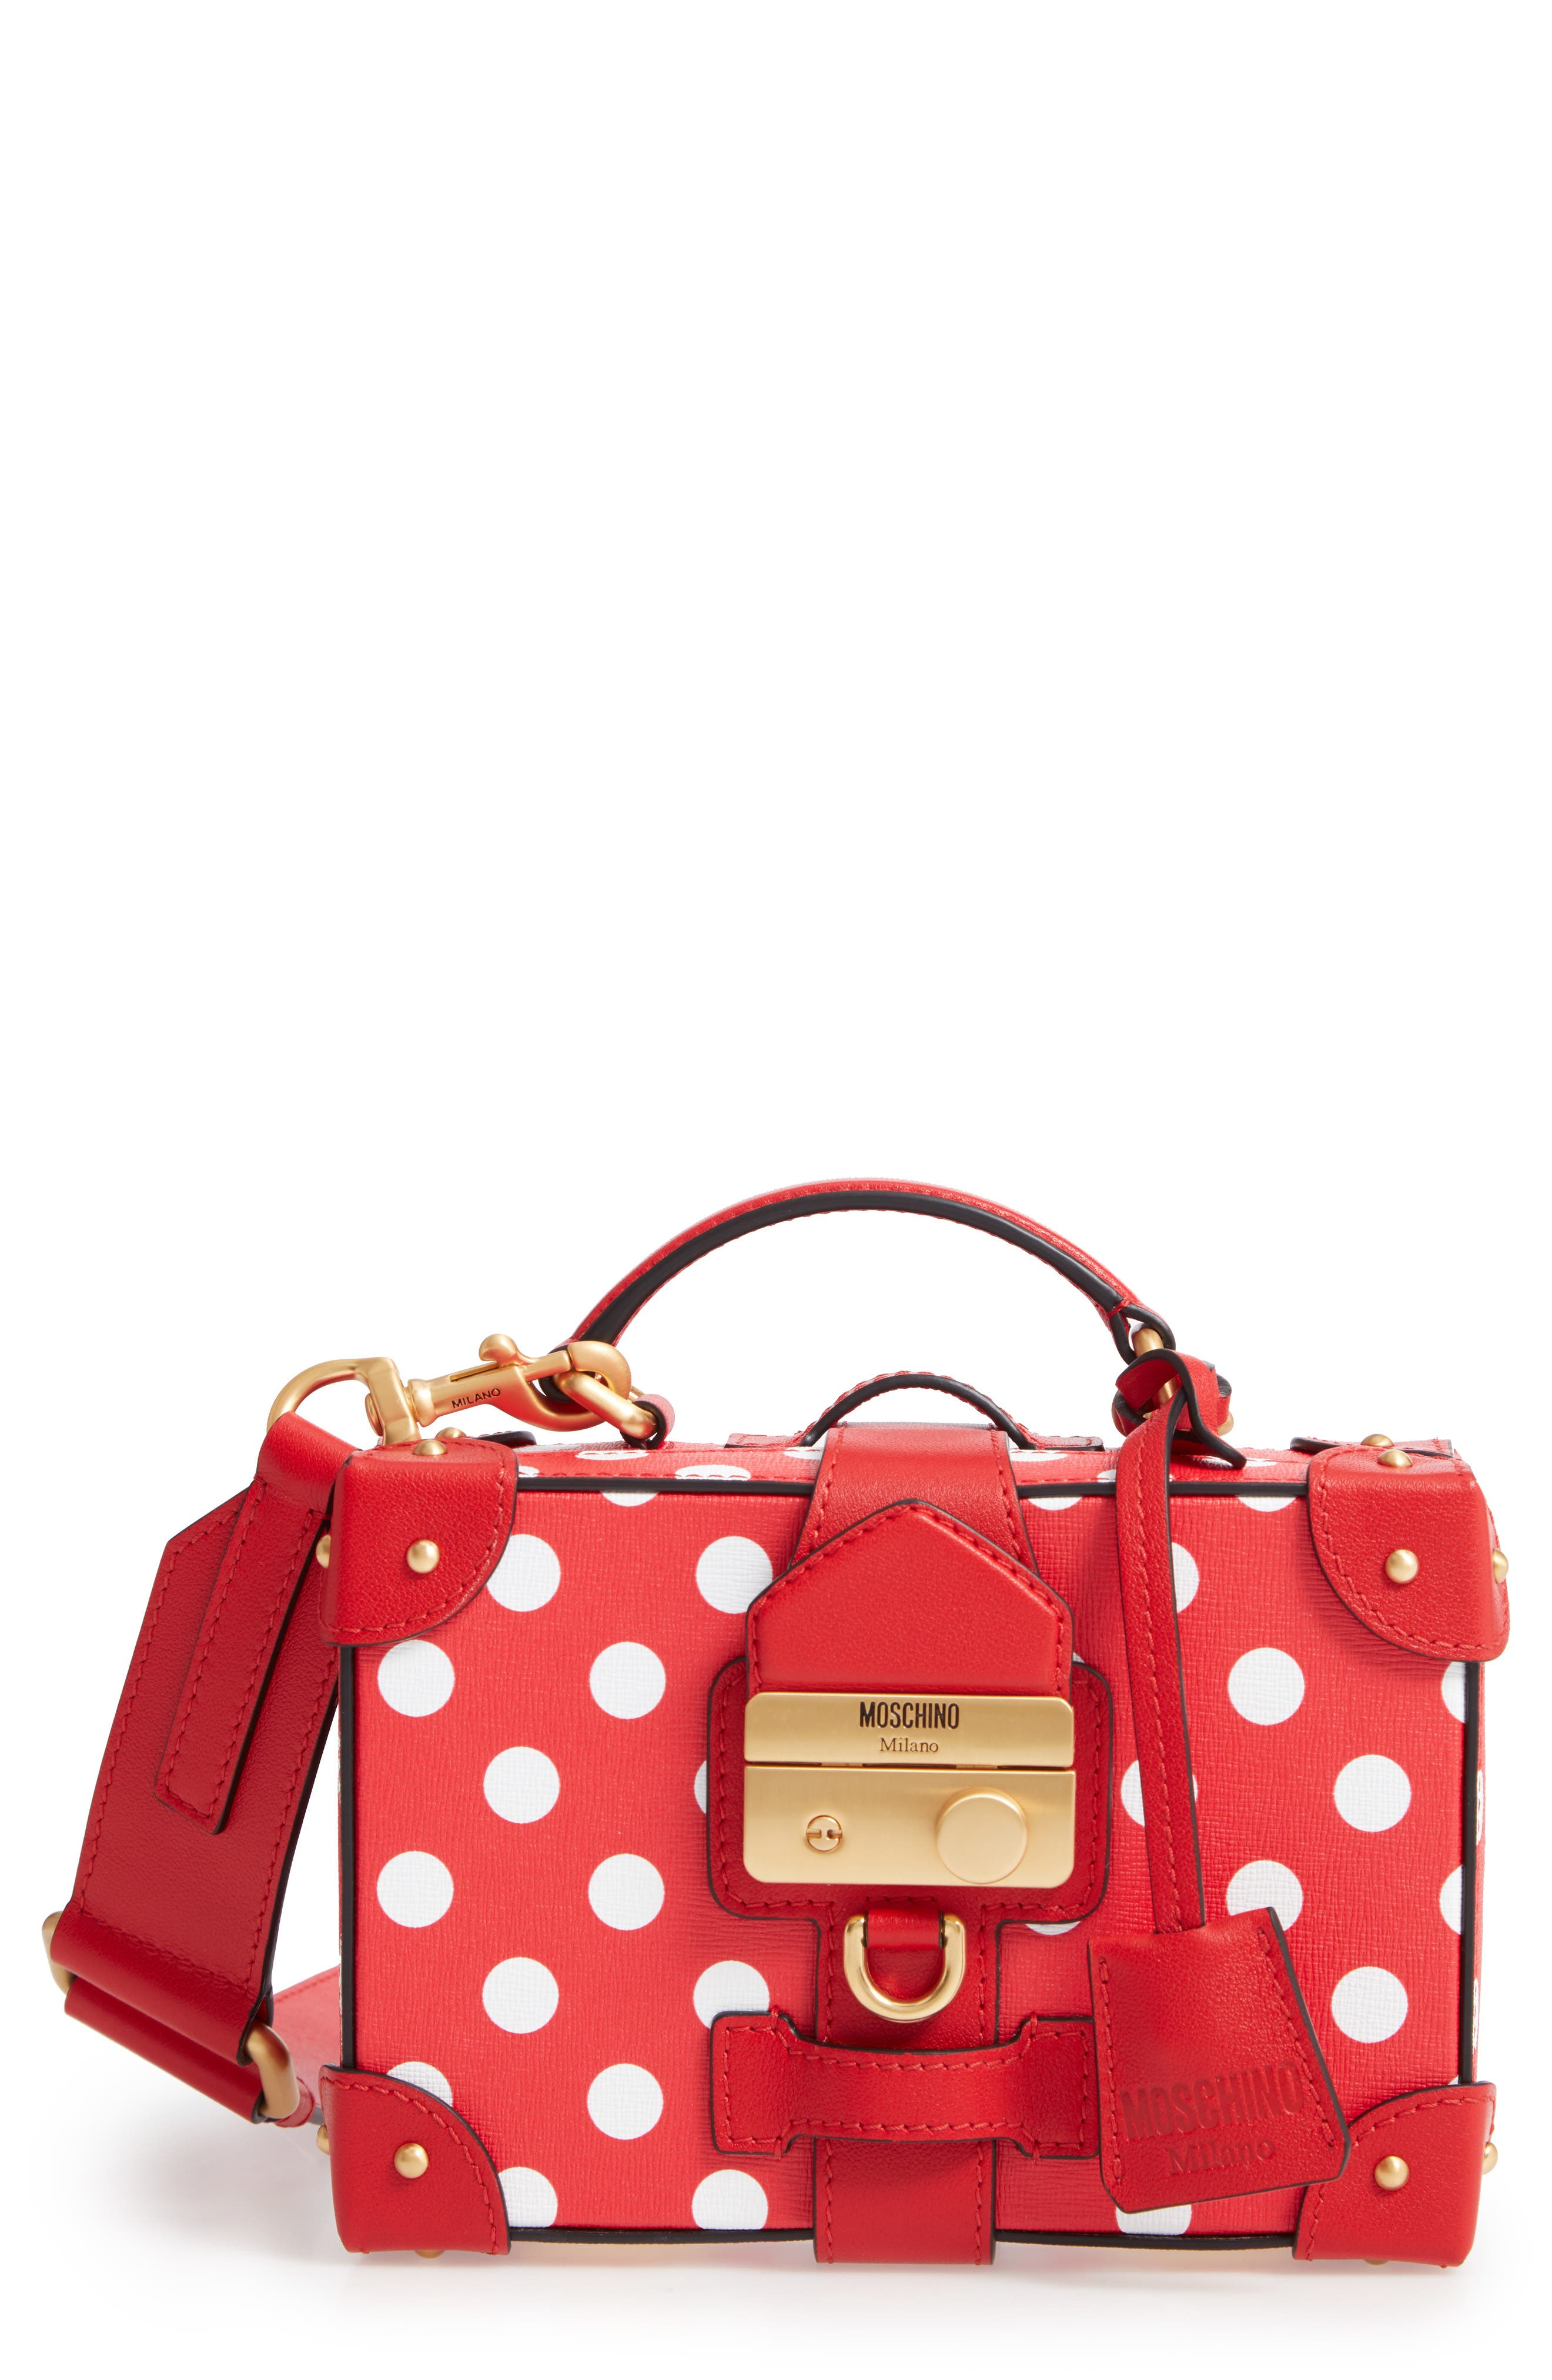 MOSCHINO Polka Dot Box Leather Crossbody Bag, Main, color, RED